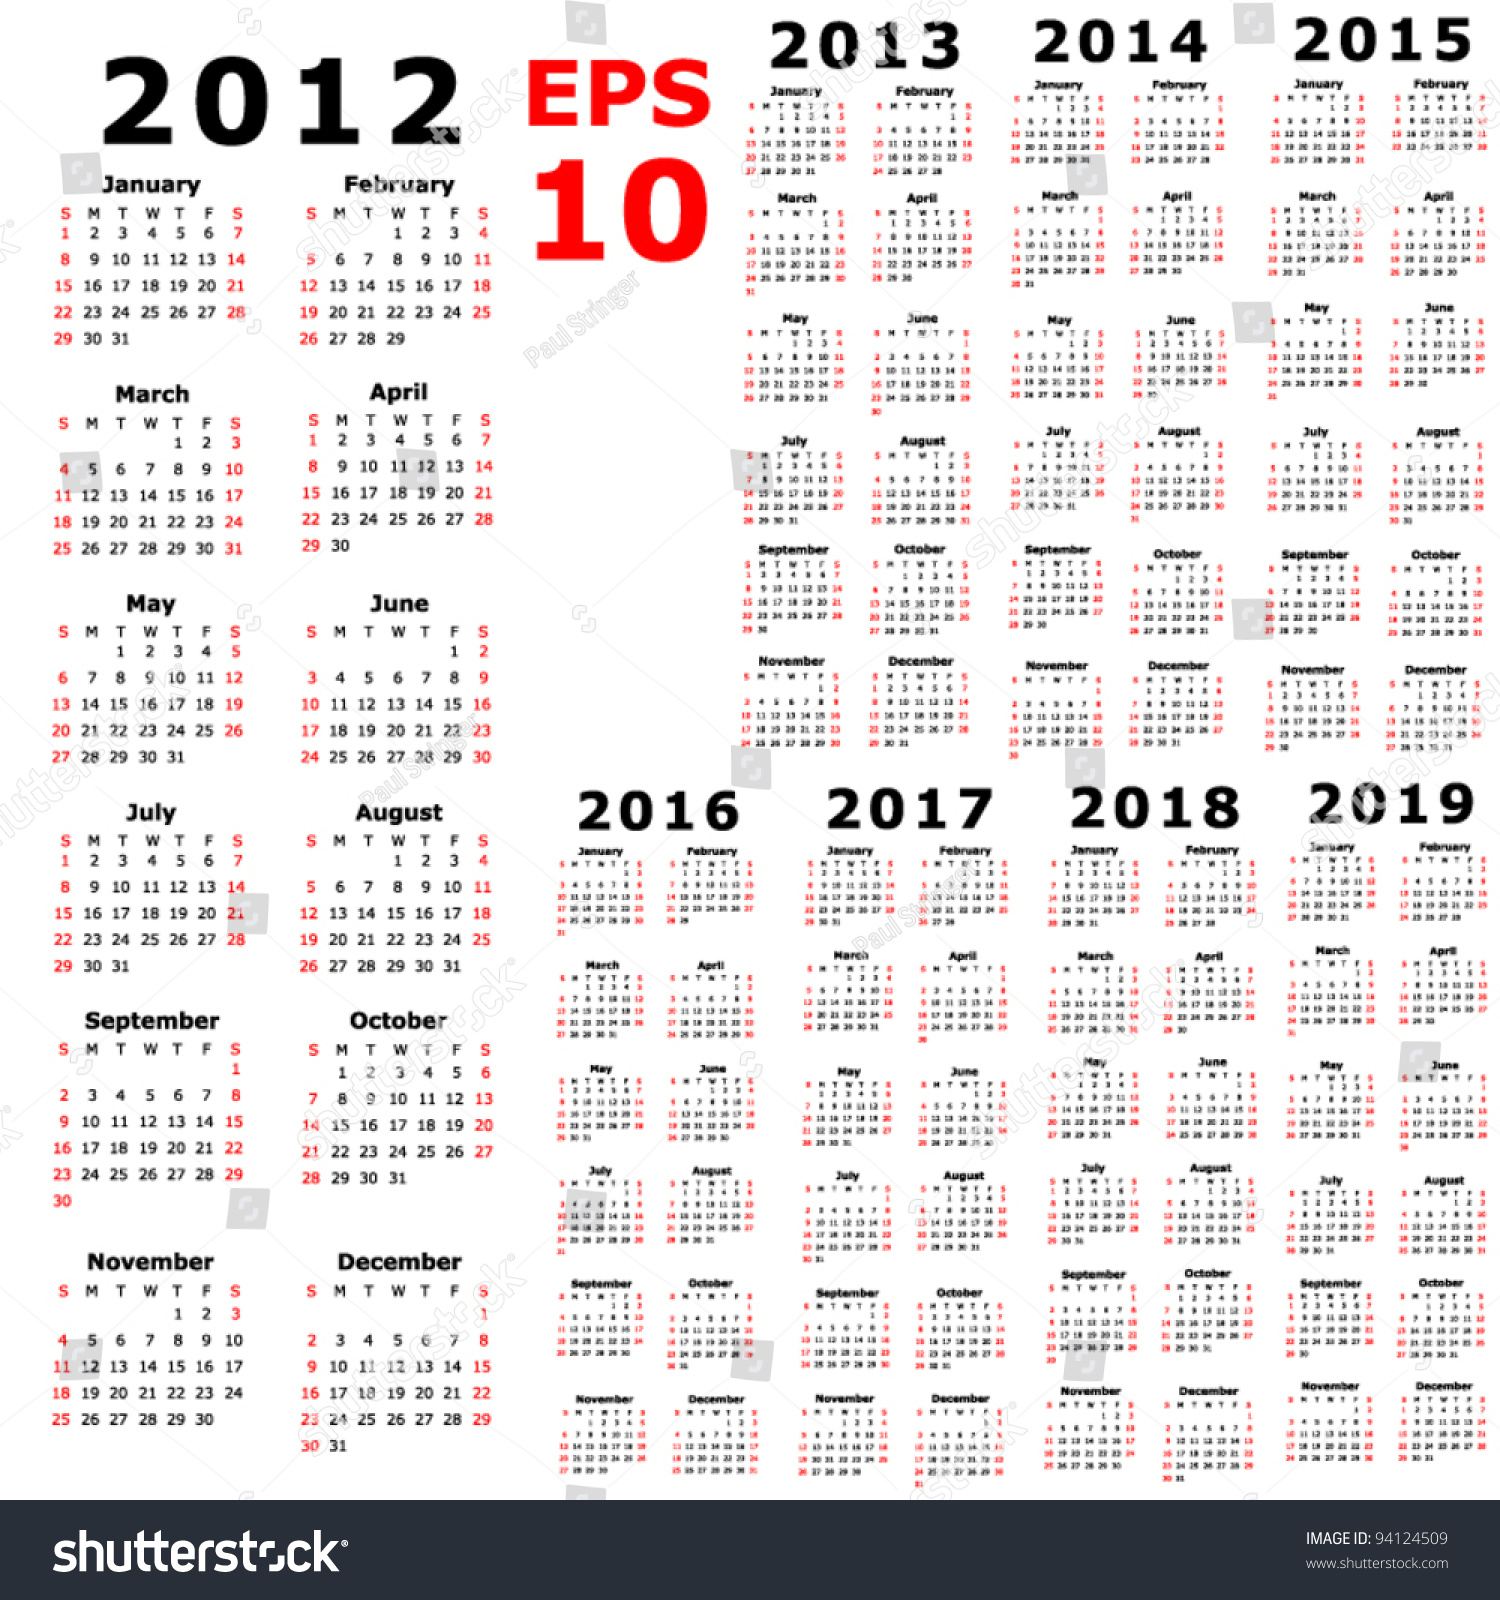 Календарь на 2017-2018 год i с